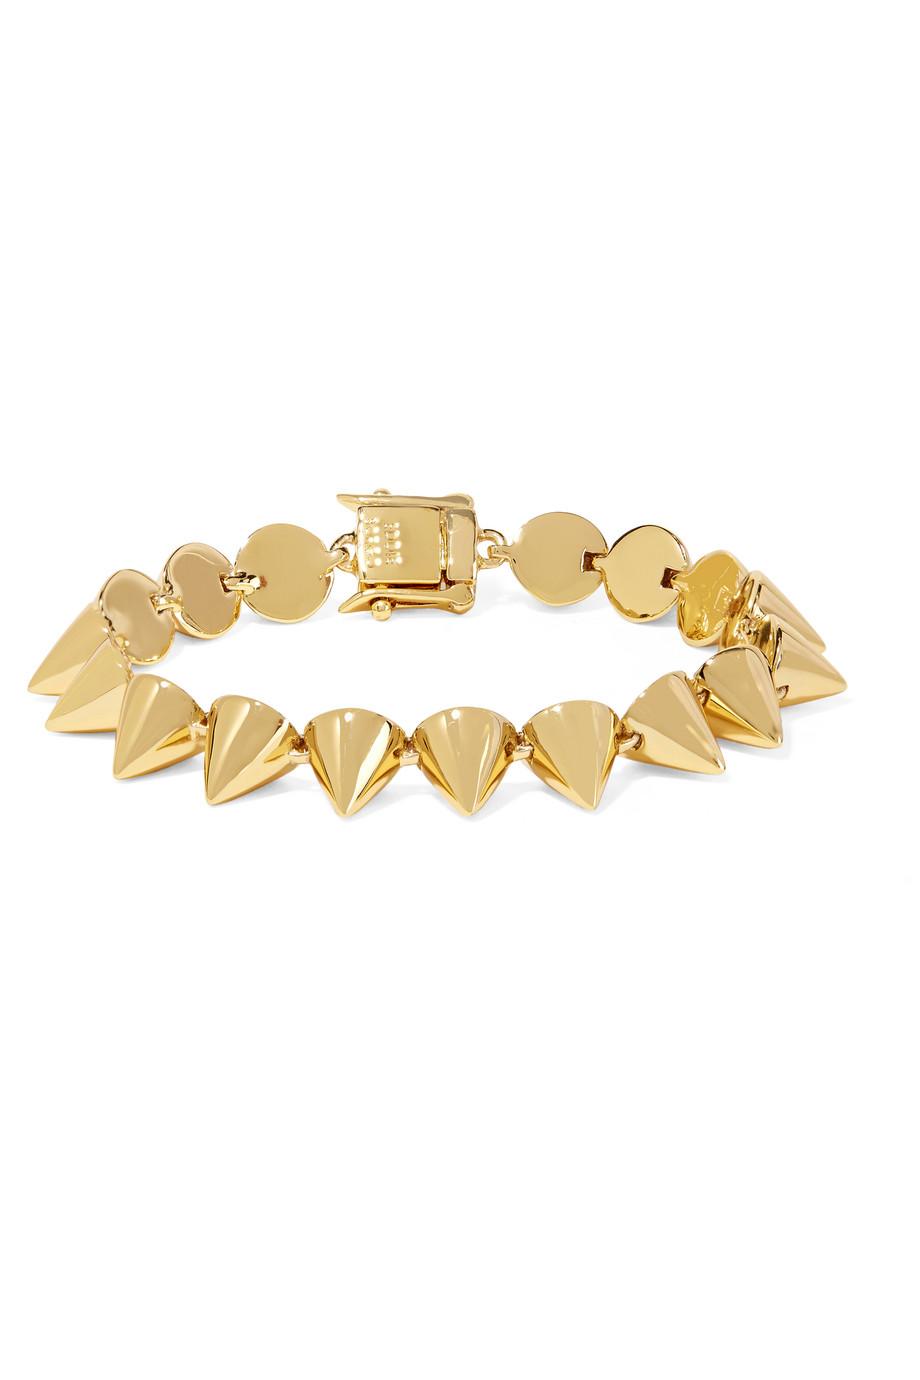 Eddie Borgo Gold-Plated Cone Bracelet, Women's